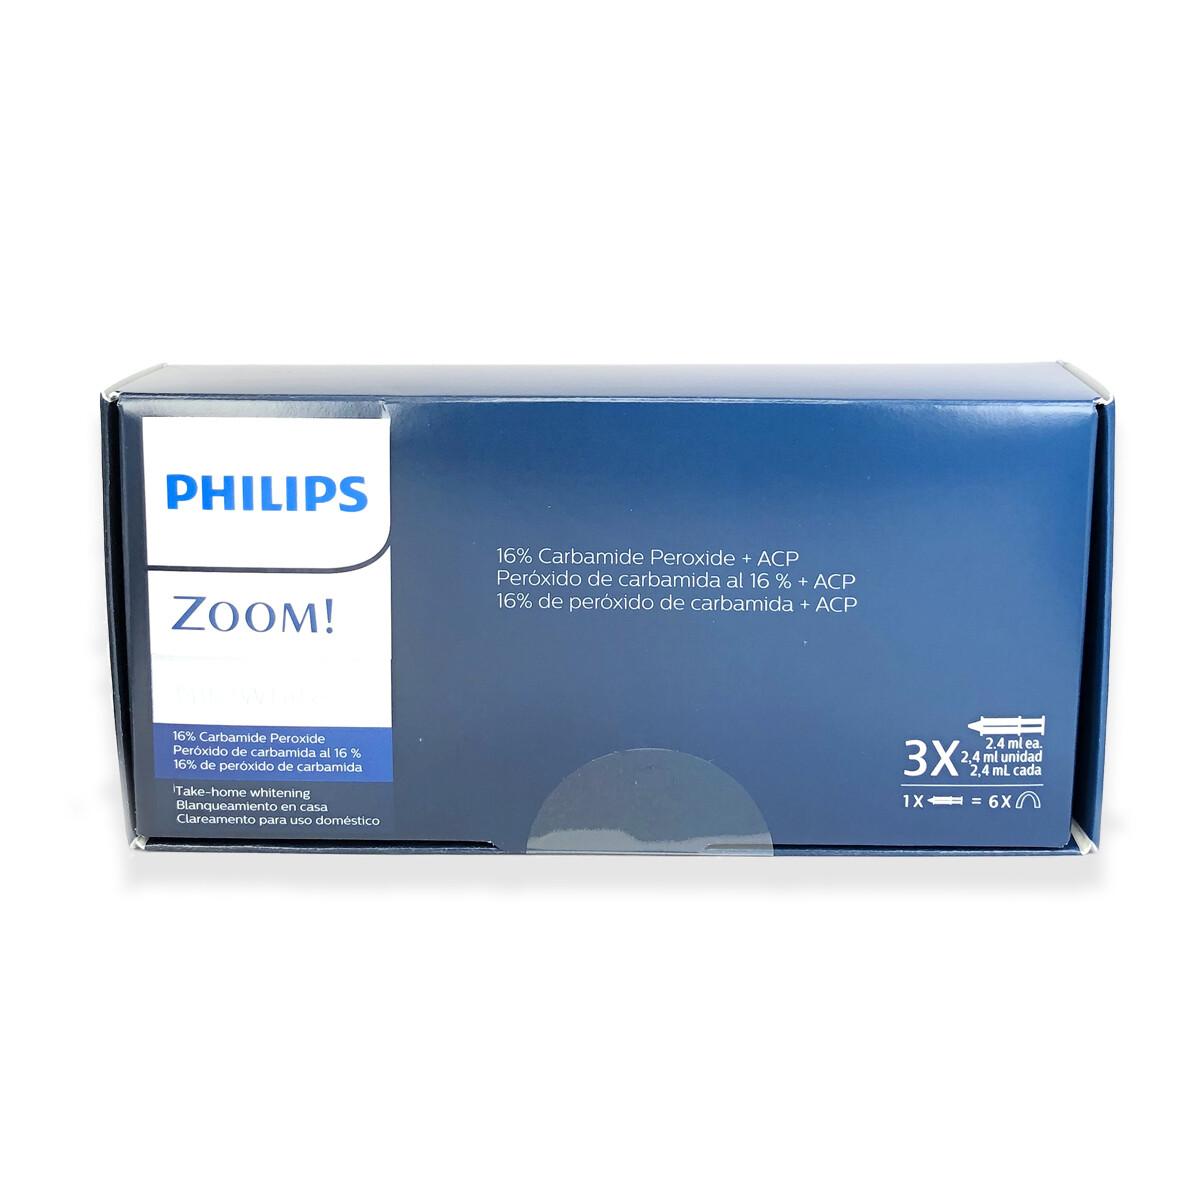 Philips Zoom NiteWhite Quick ACP 16% Teeth Whitening Kit w/ NuBox Tooth Shade Card Bundle